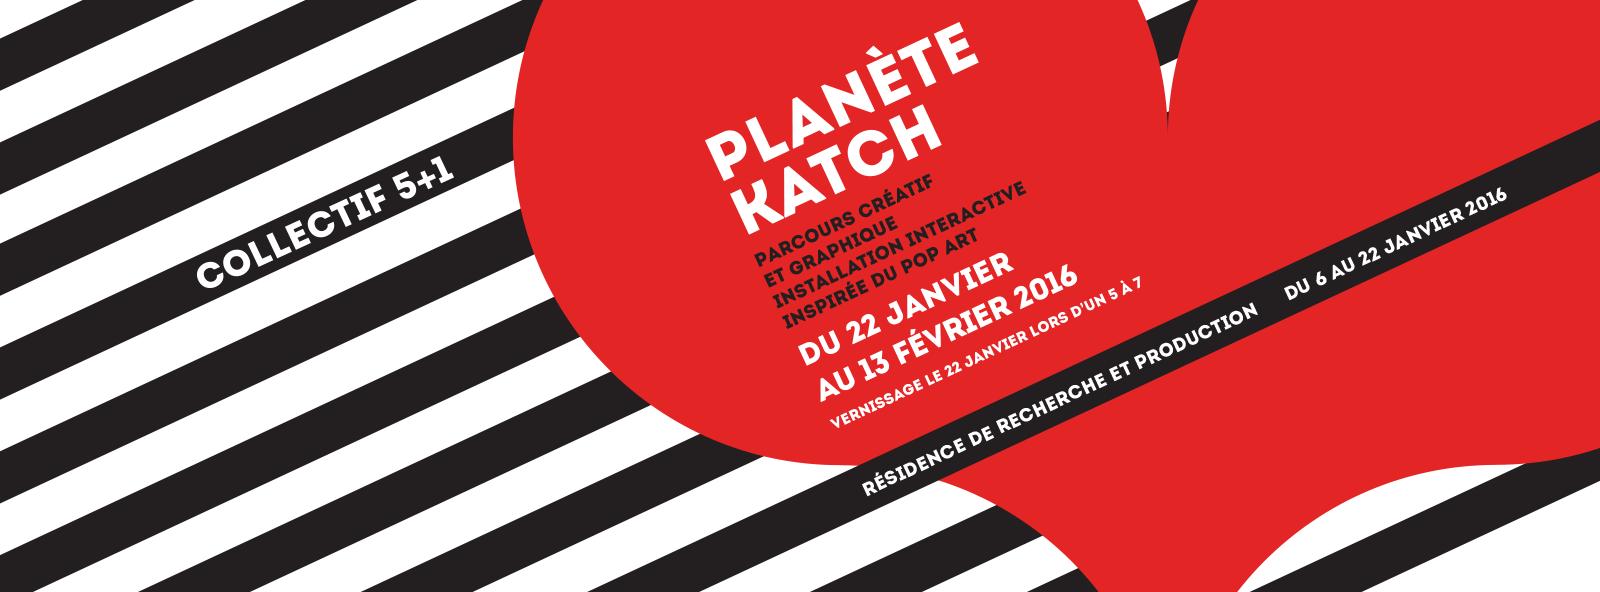 Collectif 5+1 | PLANETE KATCH